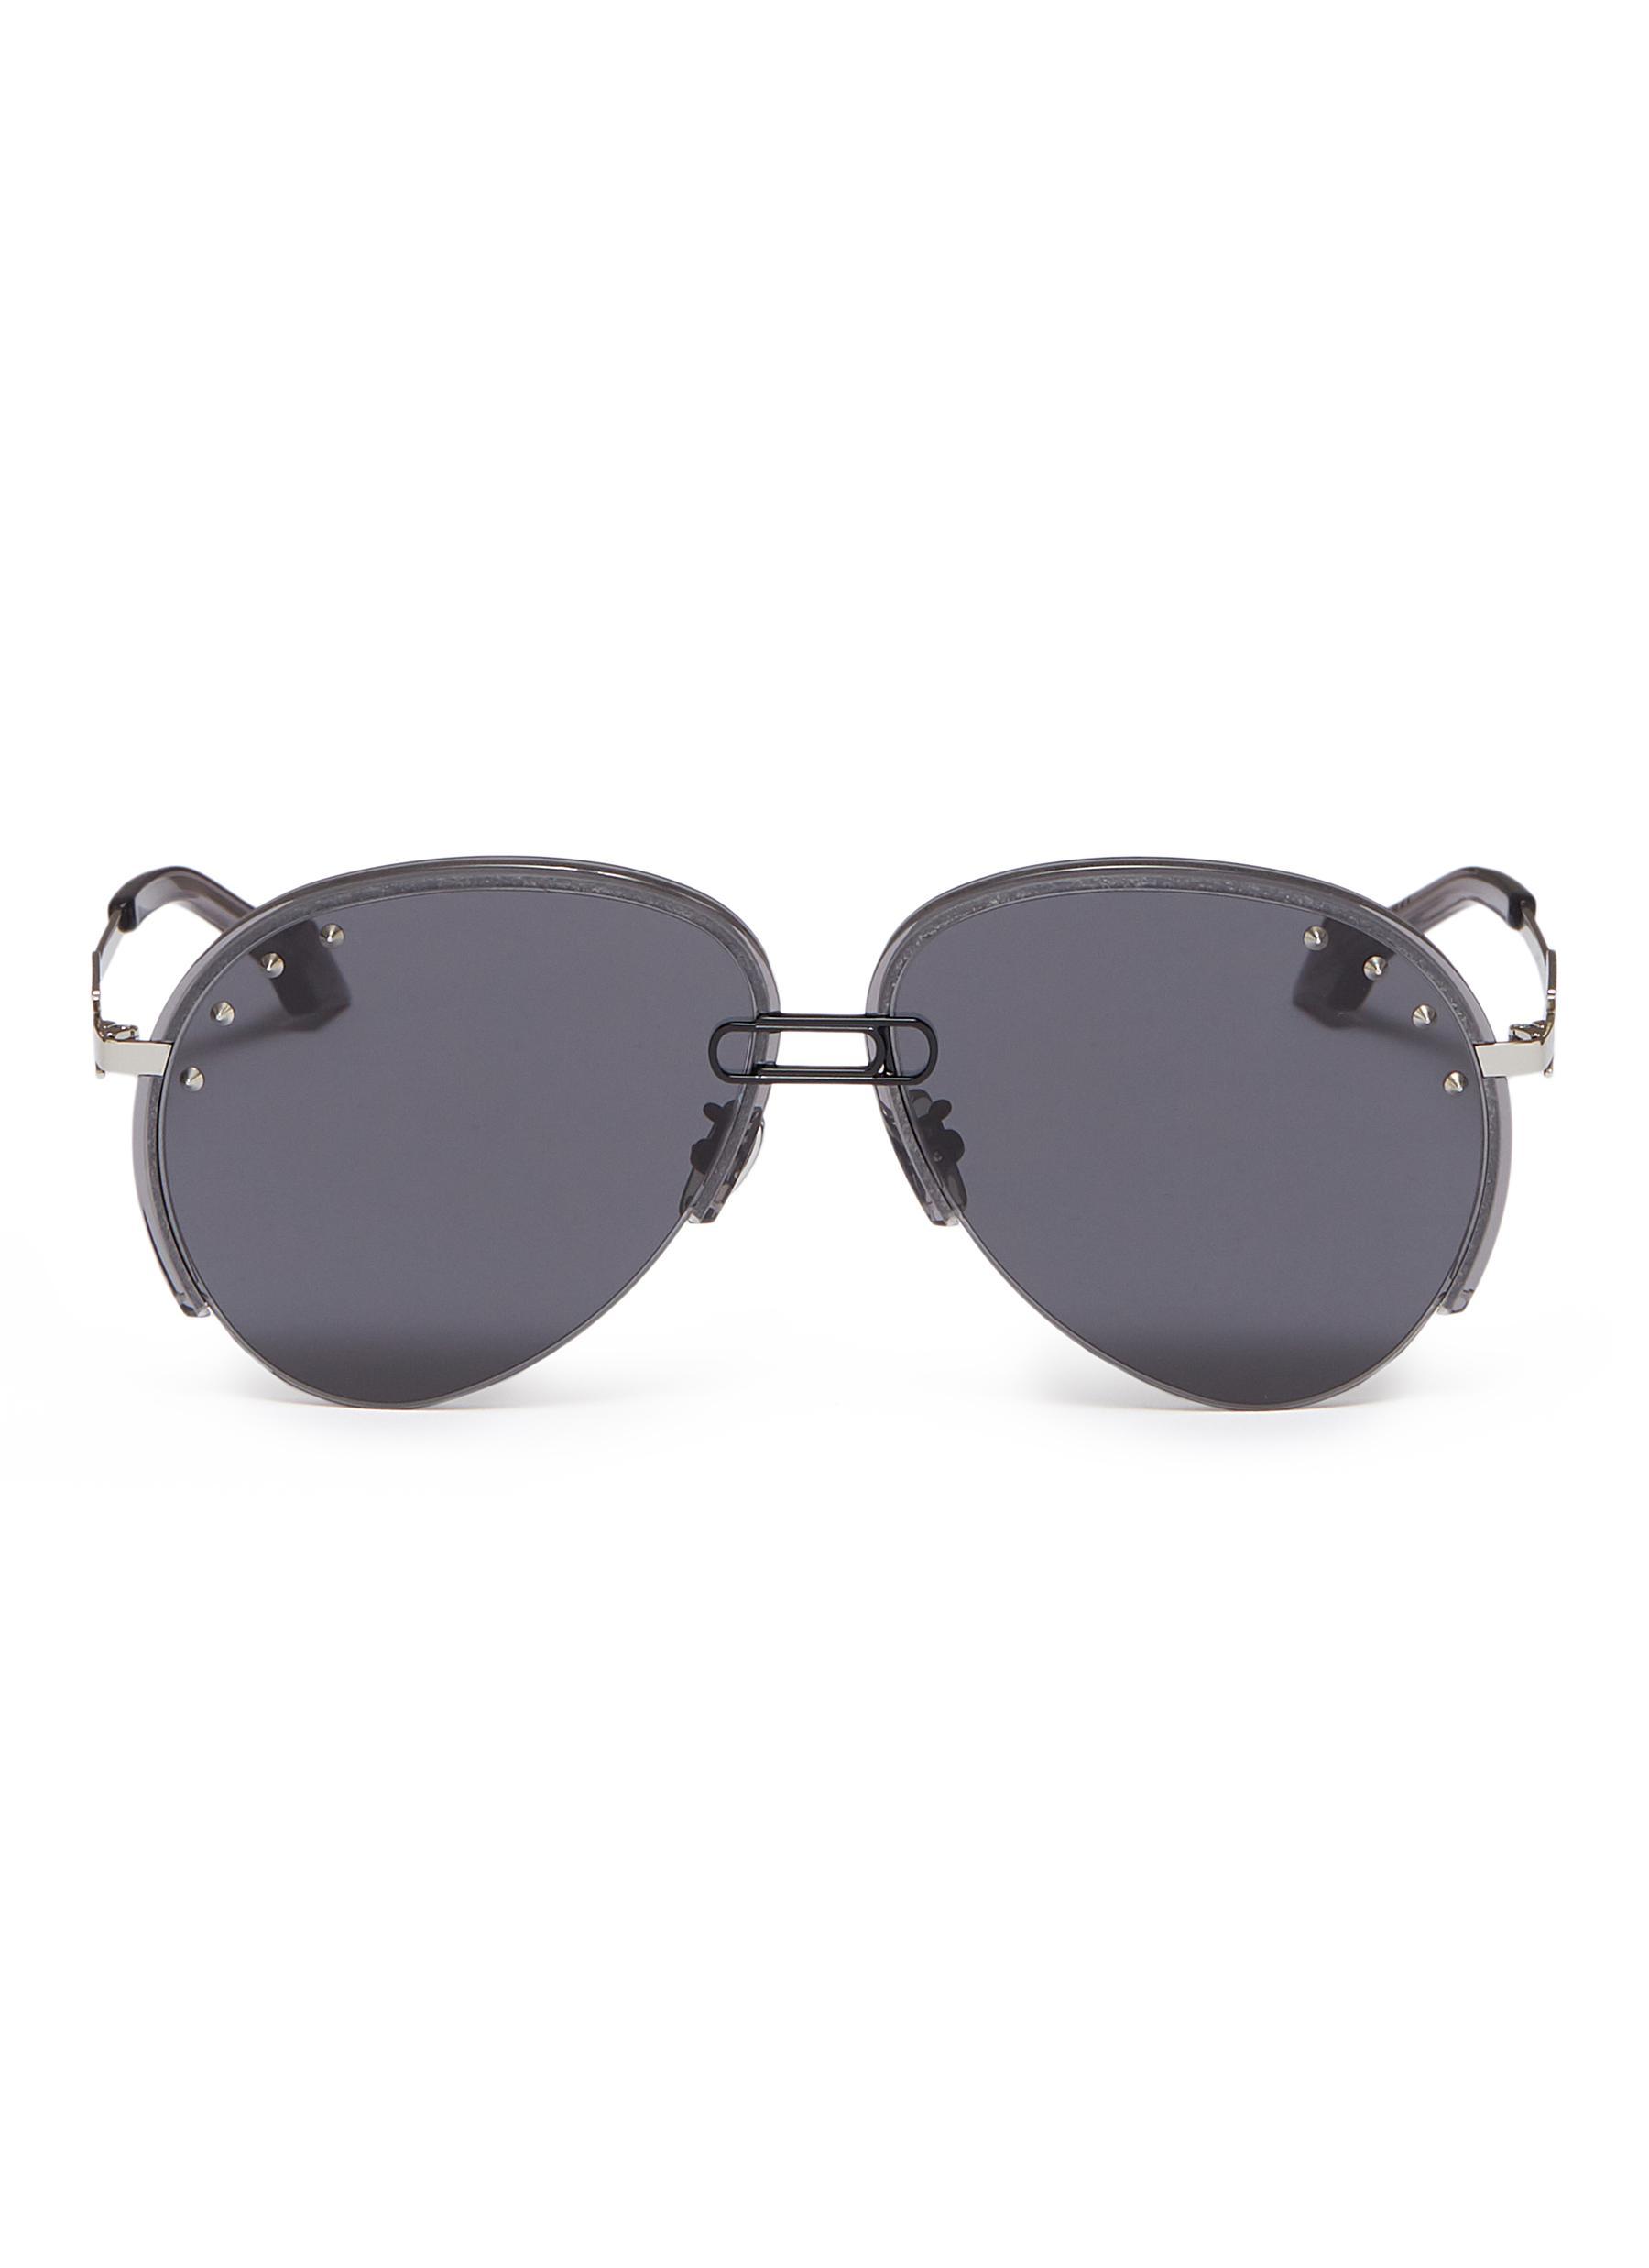 c59497761 Main View - Click To Enlarge - WHATEVER EYEWEAR - Stud metal aviator  sunglasses